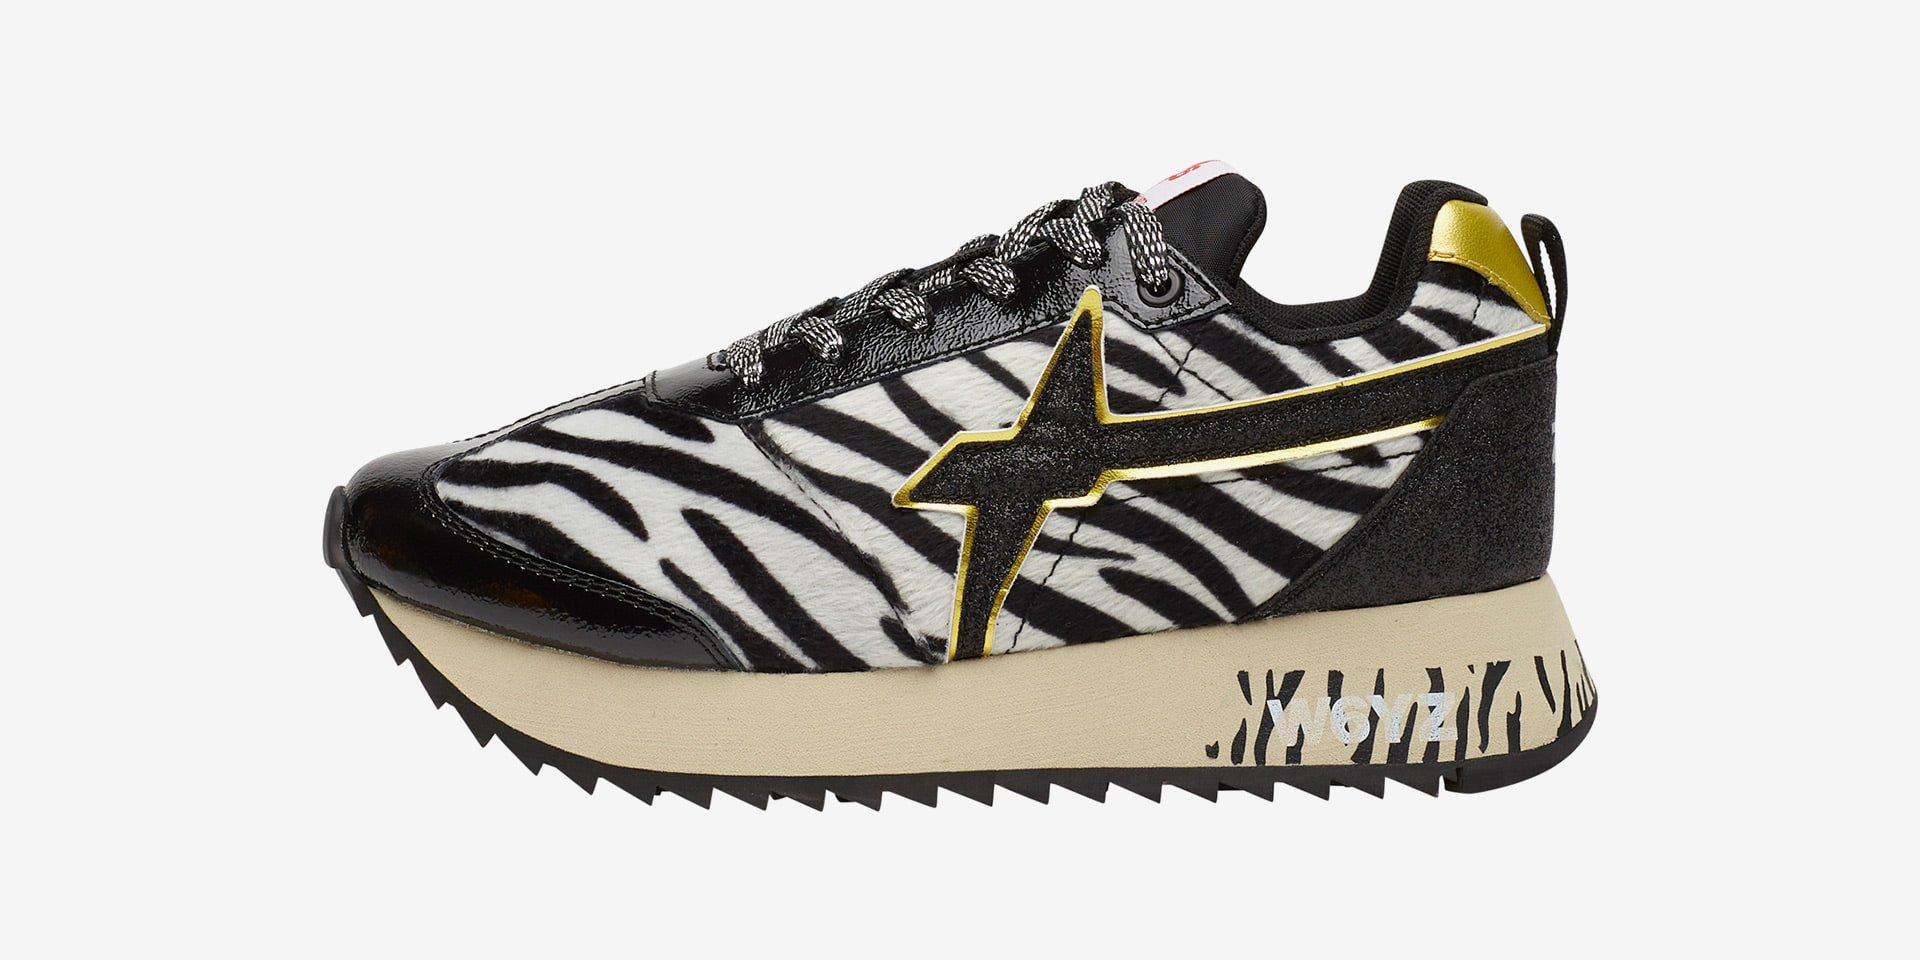 KIS-W. - Sneakers in pelle e tessuto - Nero/Zebra